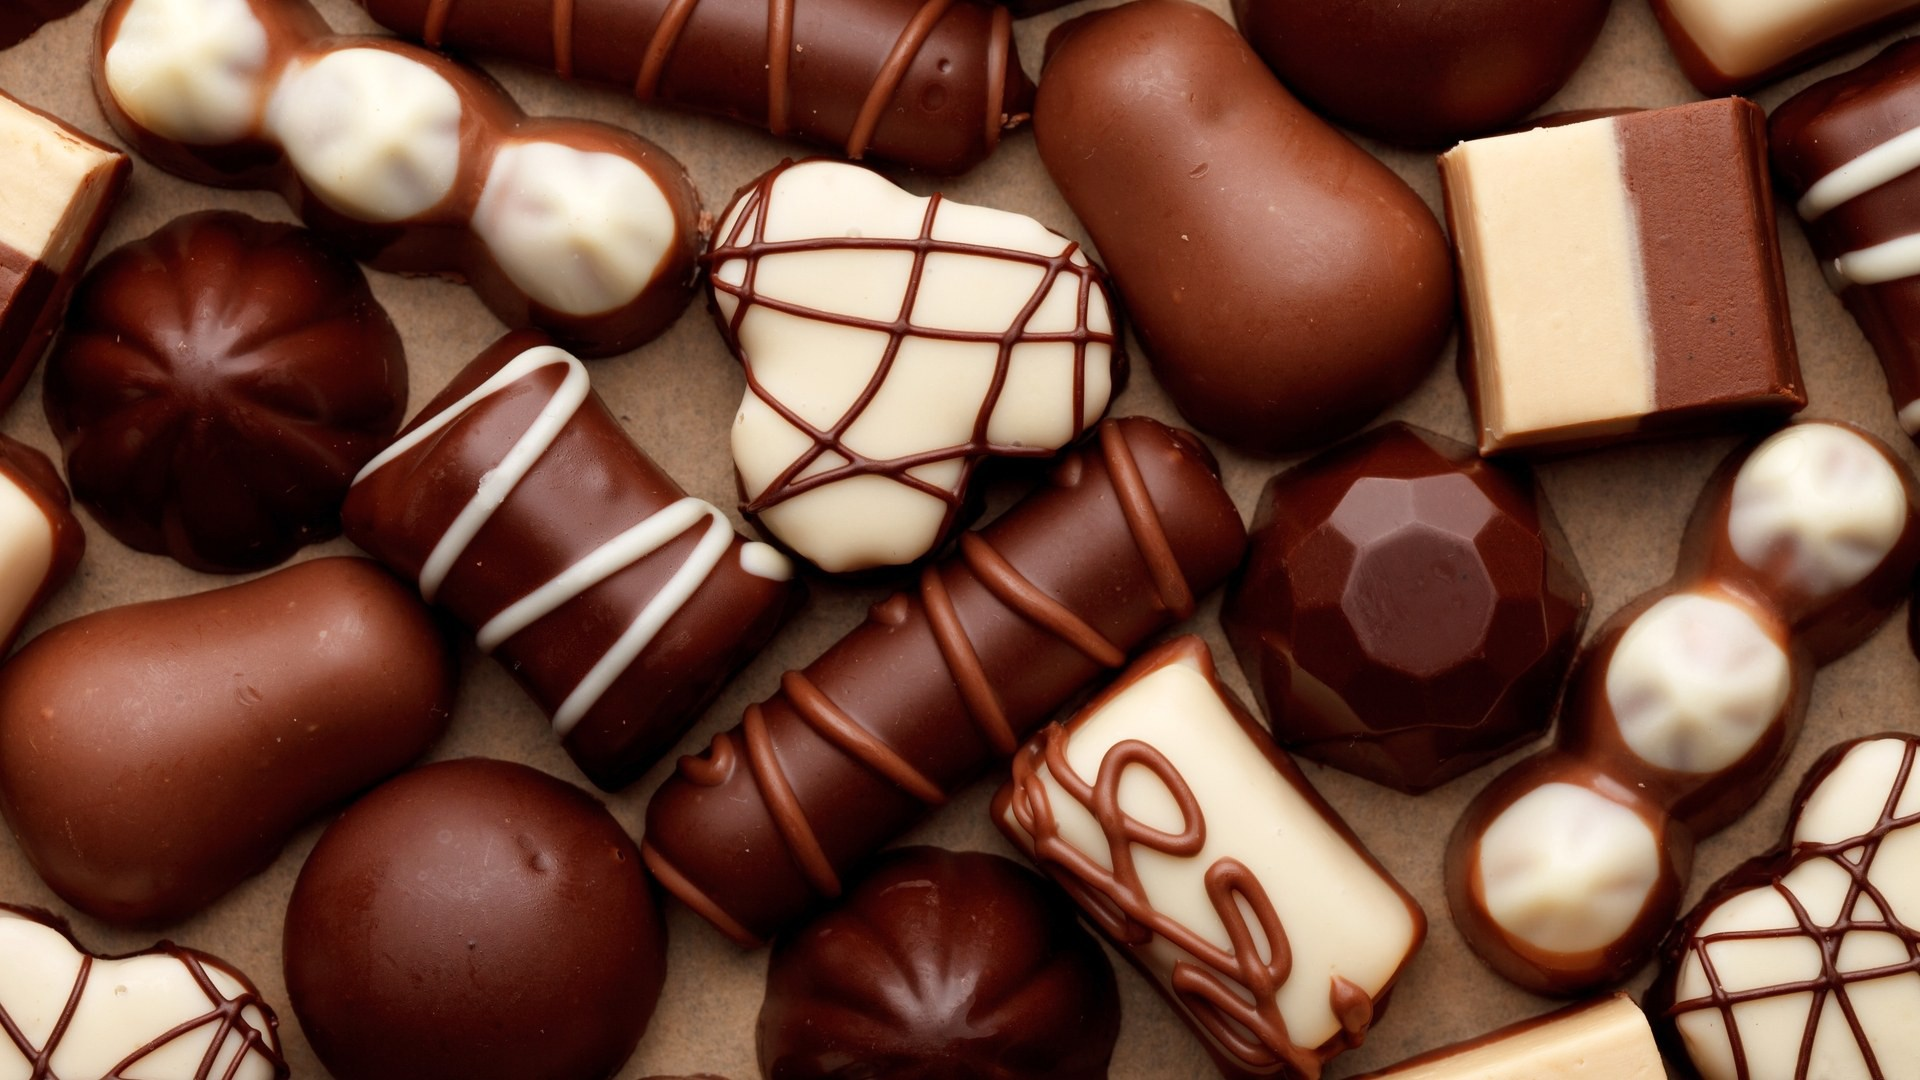 milk chocolate wallpaper yummy ...